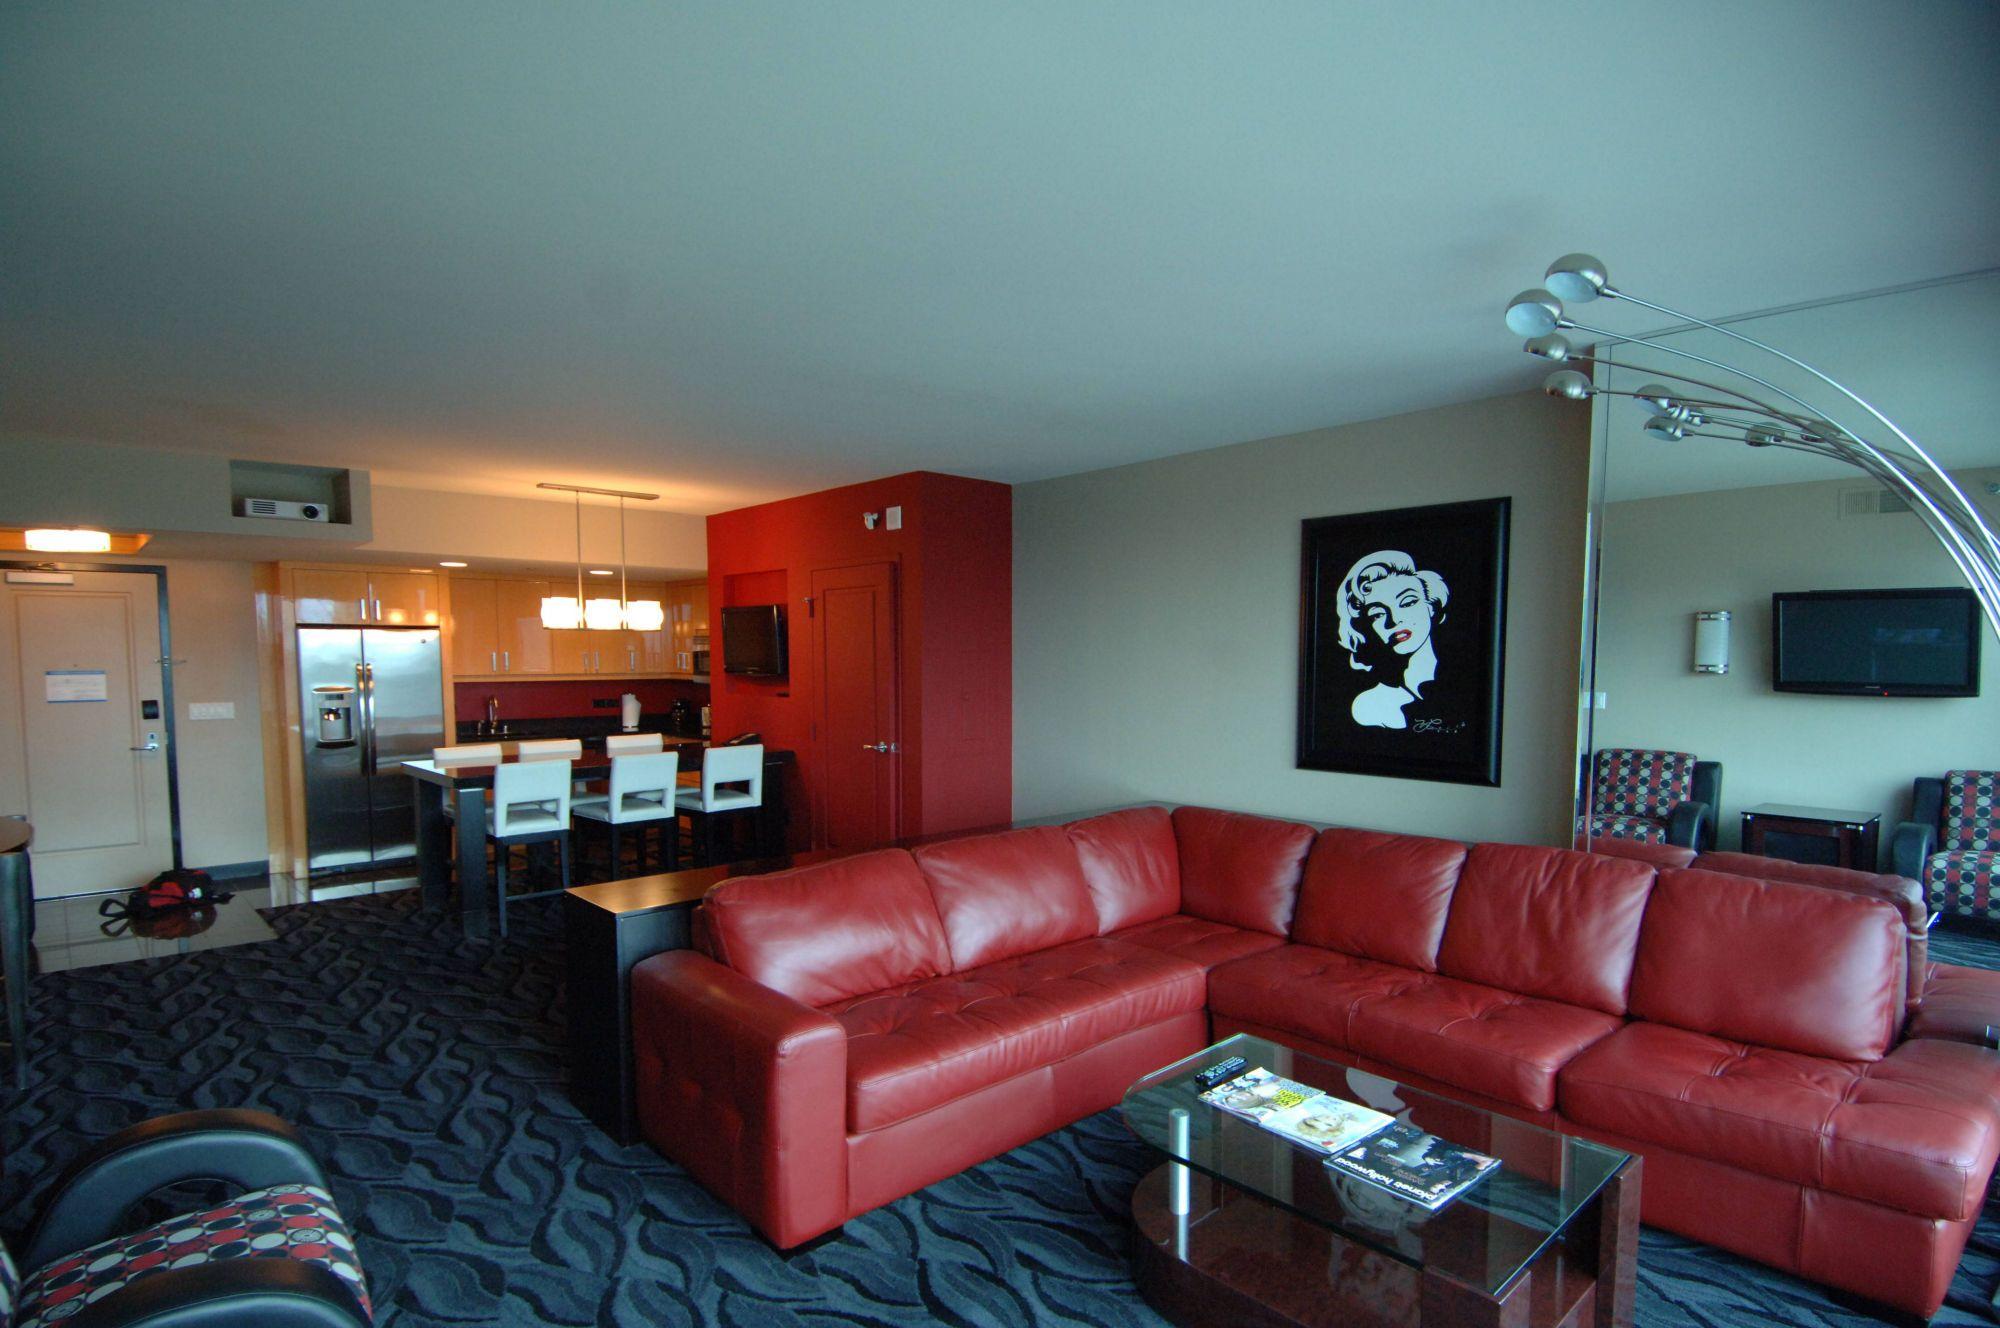 3 bedroom suites in las vegas pictures | a1houston